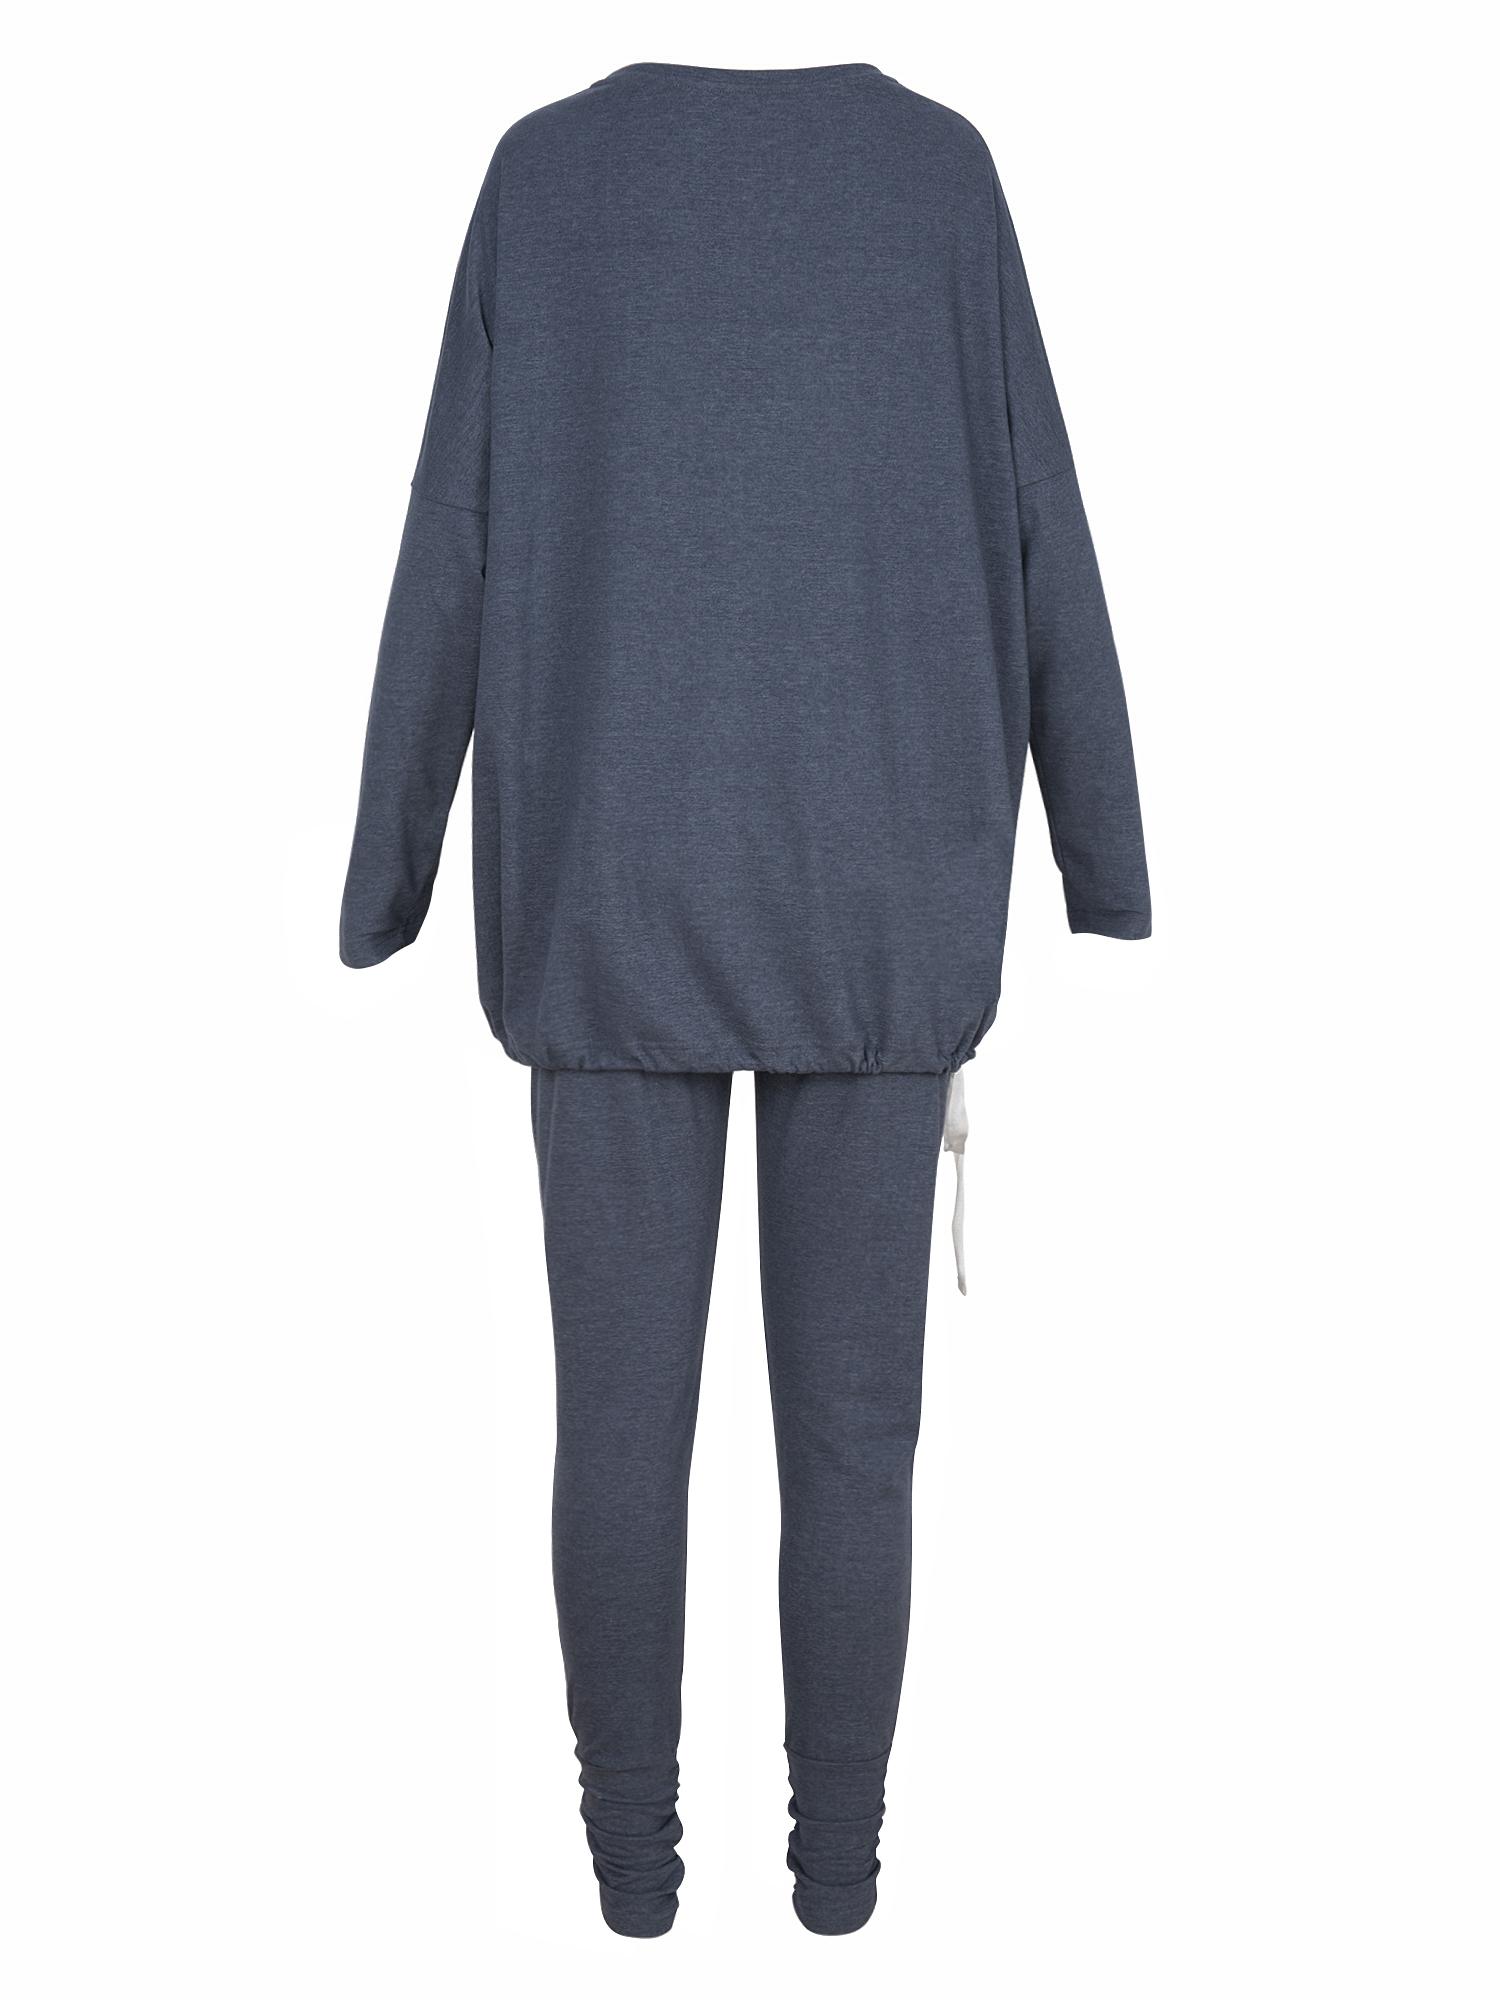 Maternity Pajamas for Hospital Set Long Sleeve Breastfeeding Pregnancy Clothing Sleepwear Nursing Pajamas